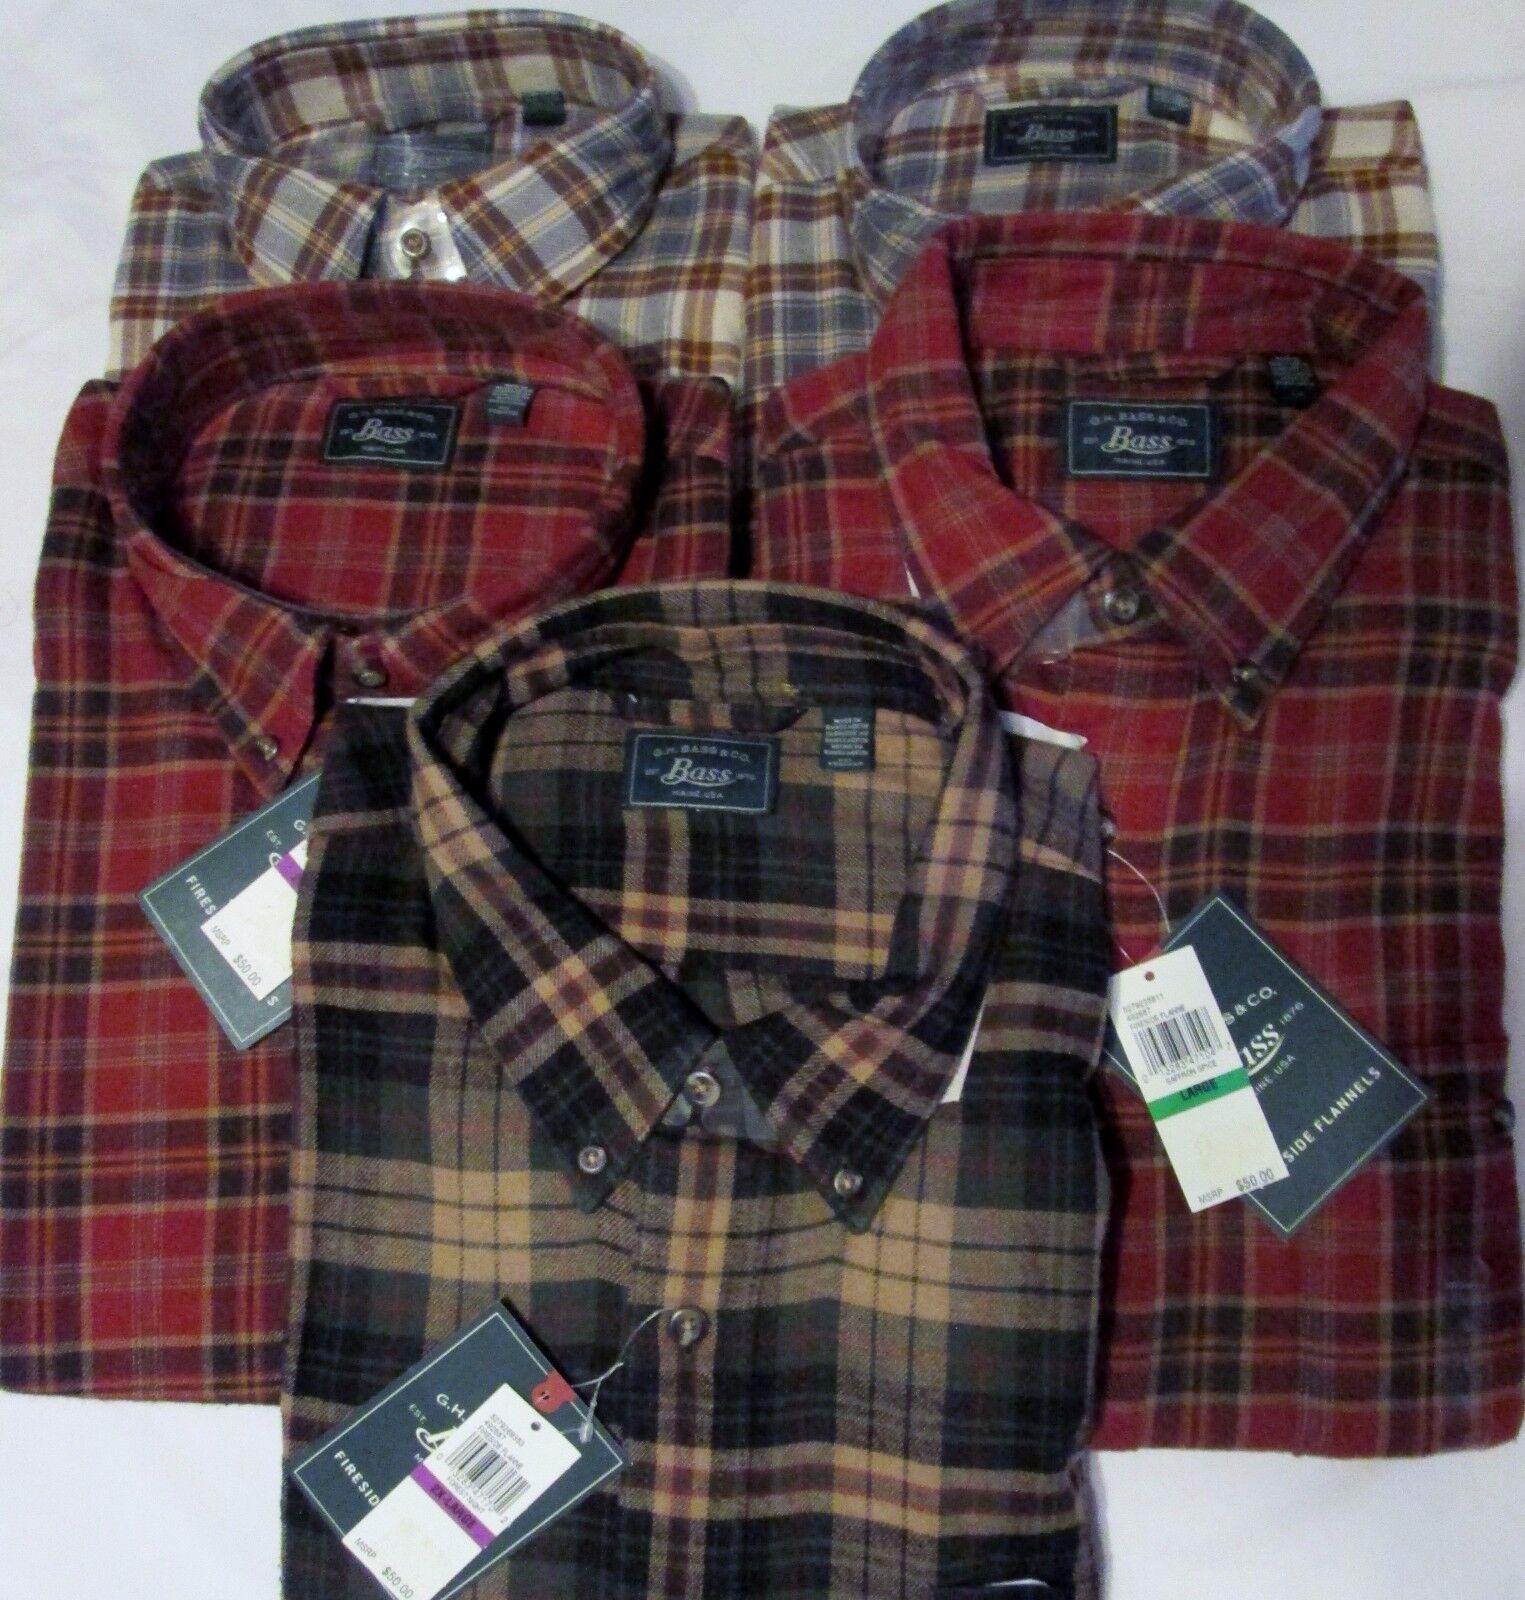 NWT Men's G. H. BASS & Co. Fireside Plaid Flannel Shirts Ret